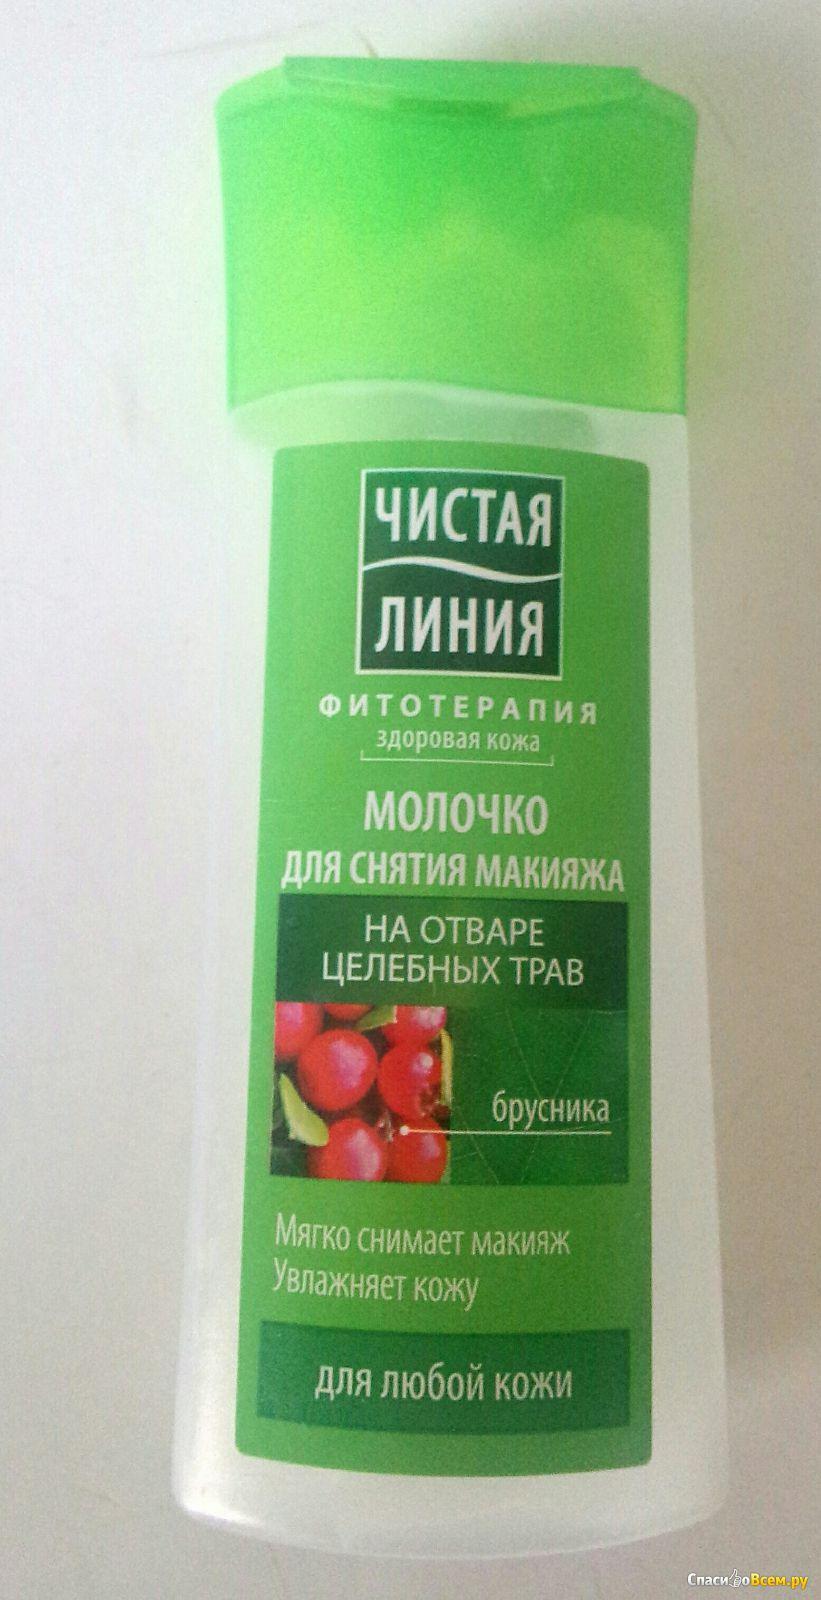 Молочко для снятия макияжа чистая линия брусника цена